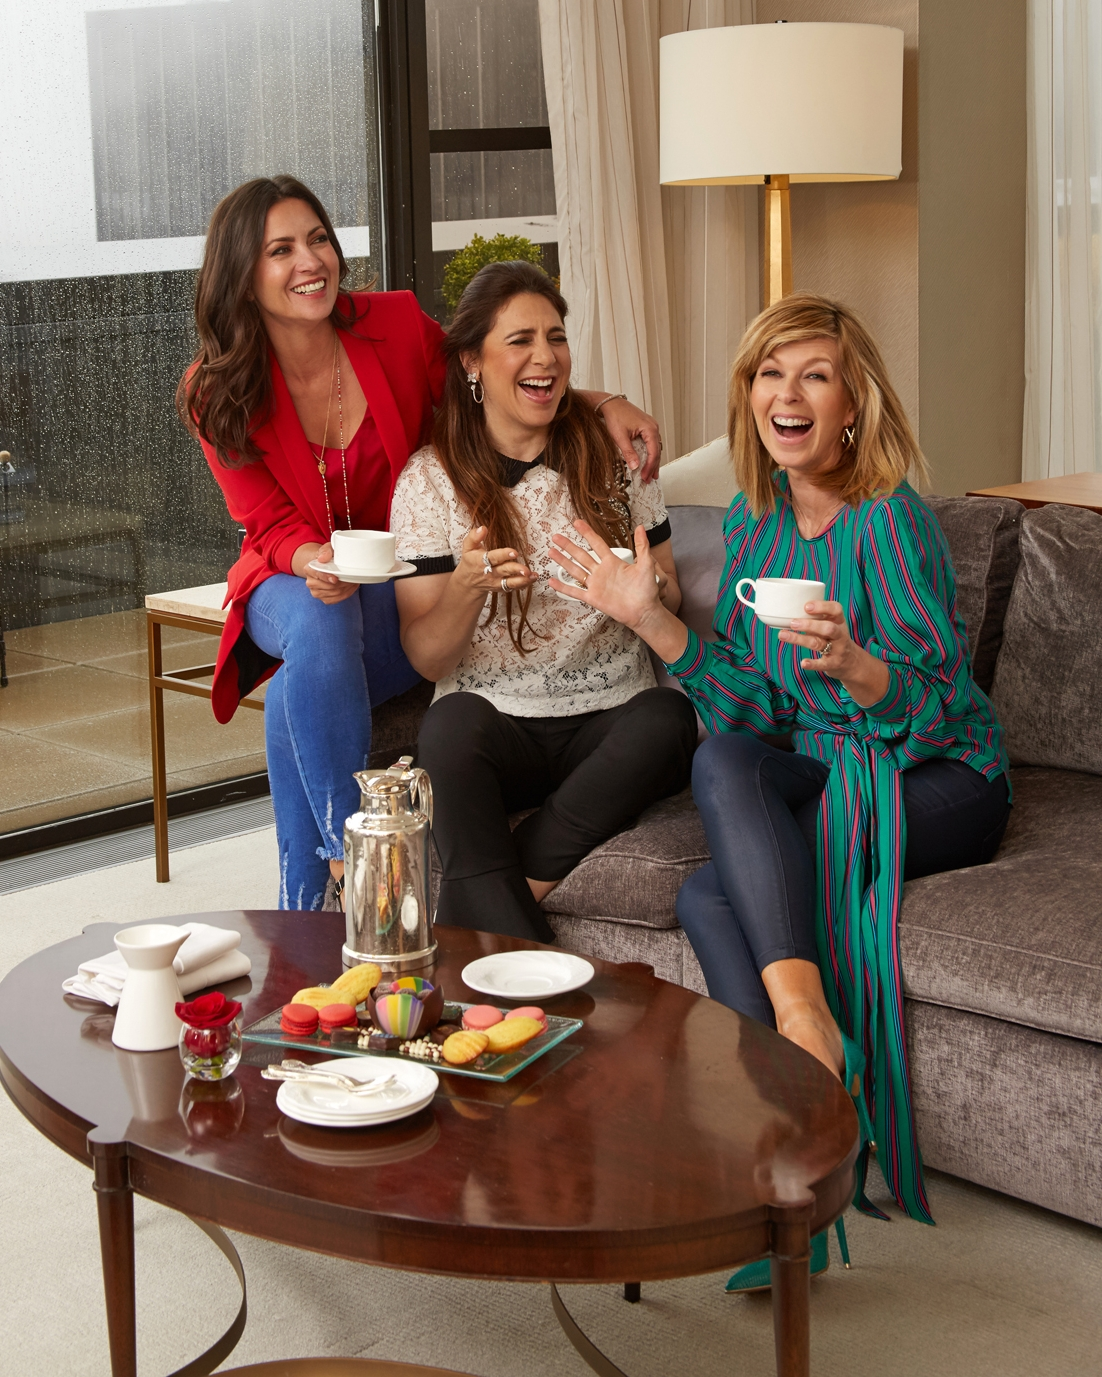 Clare Nasir, Carla Romano, Kate Garraway